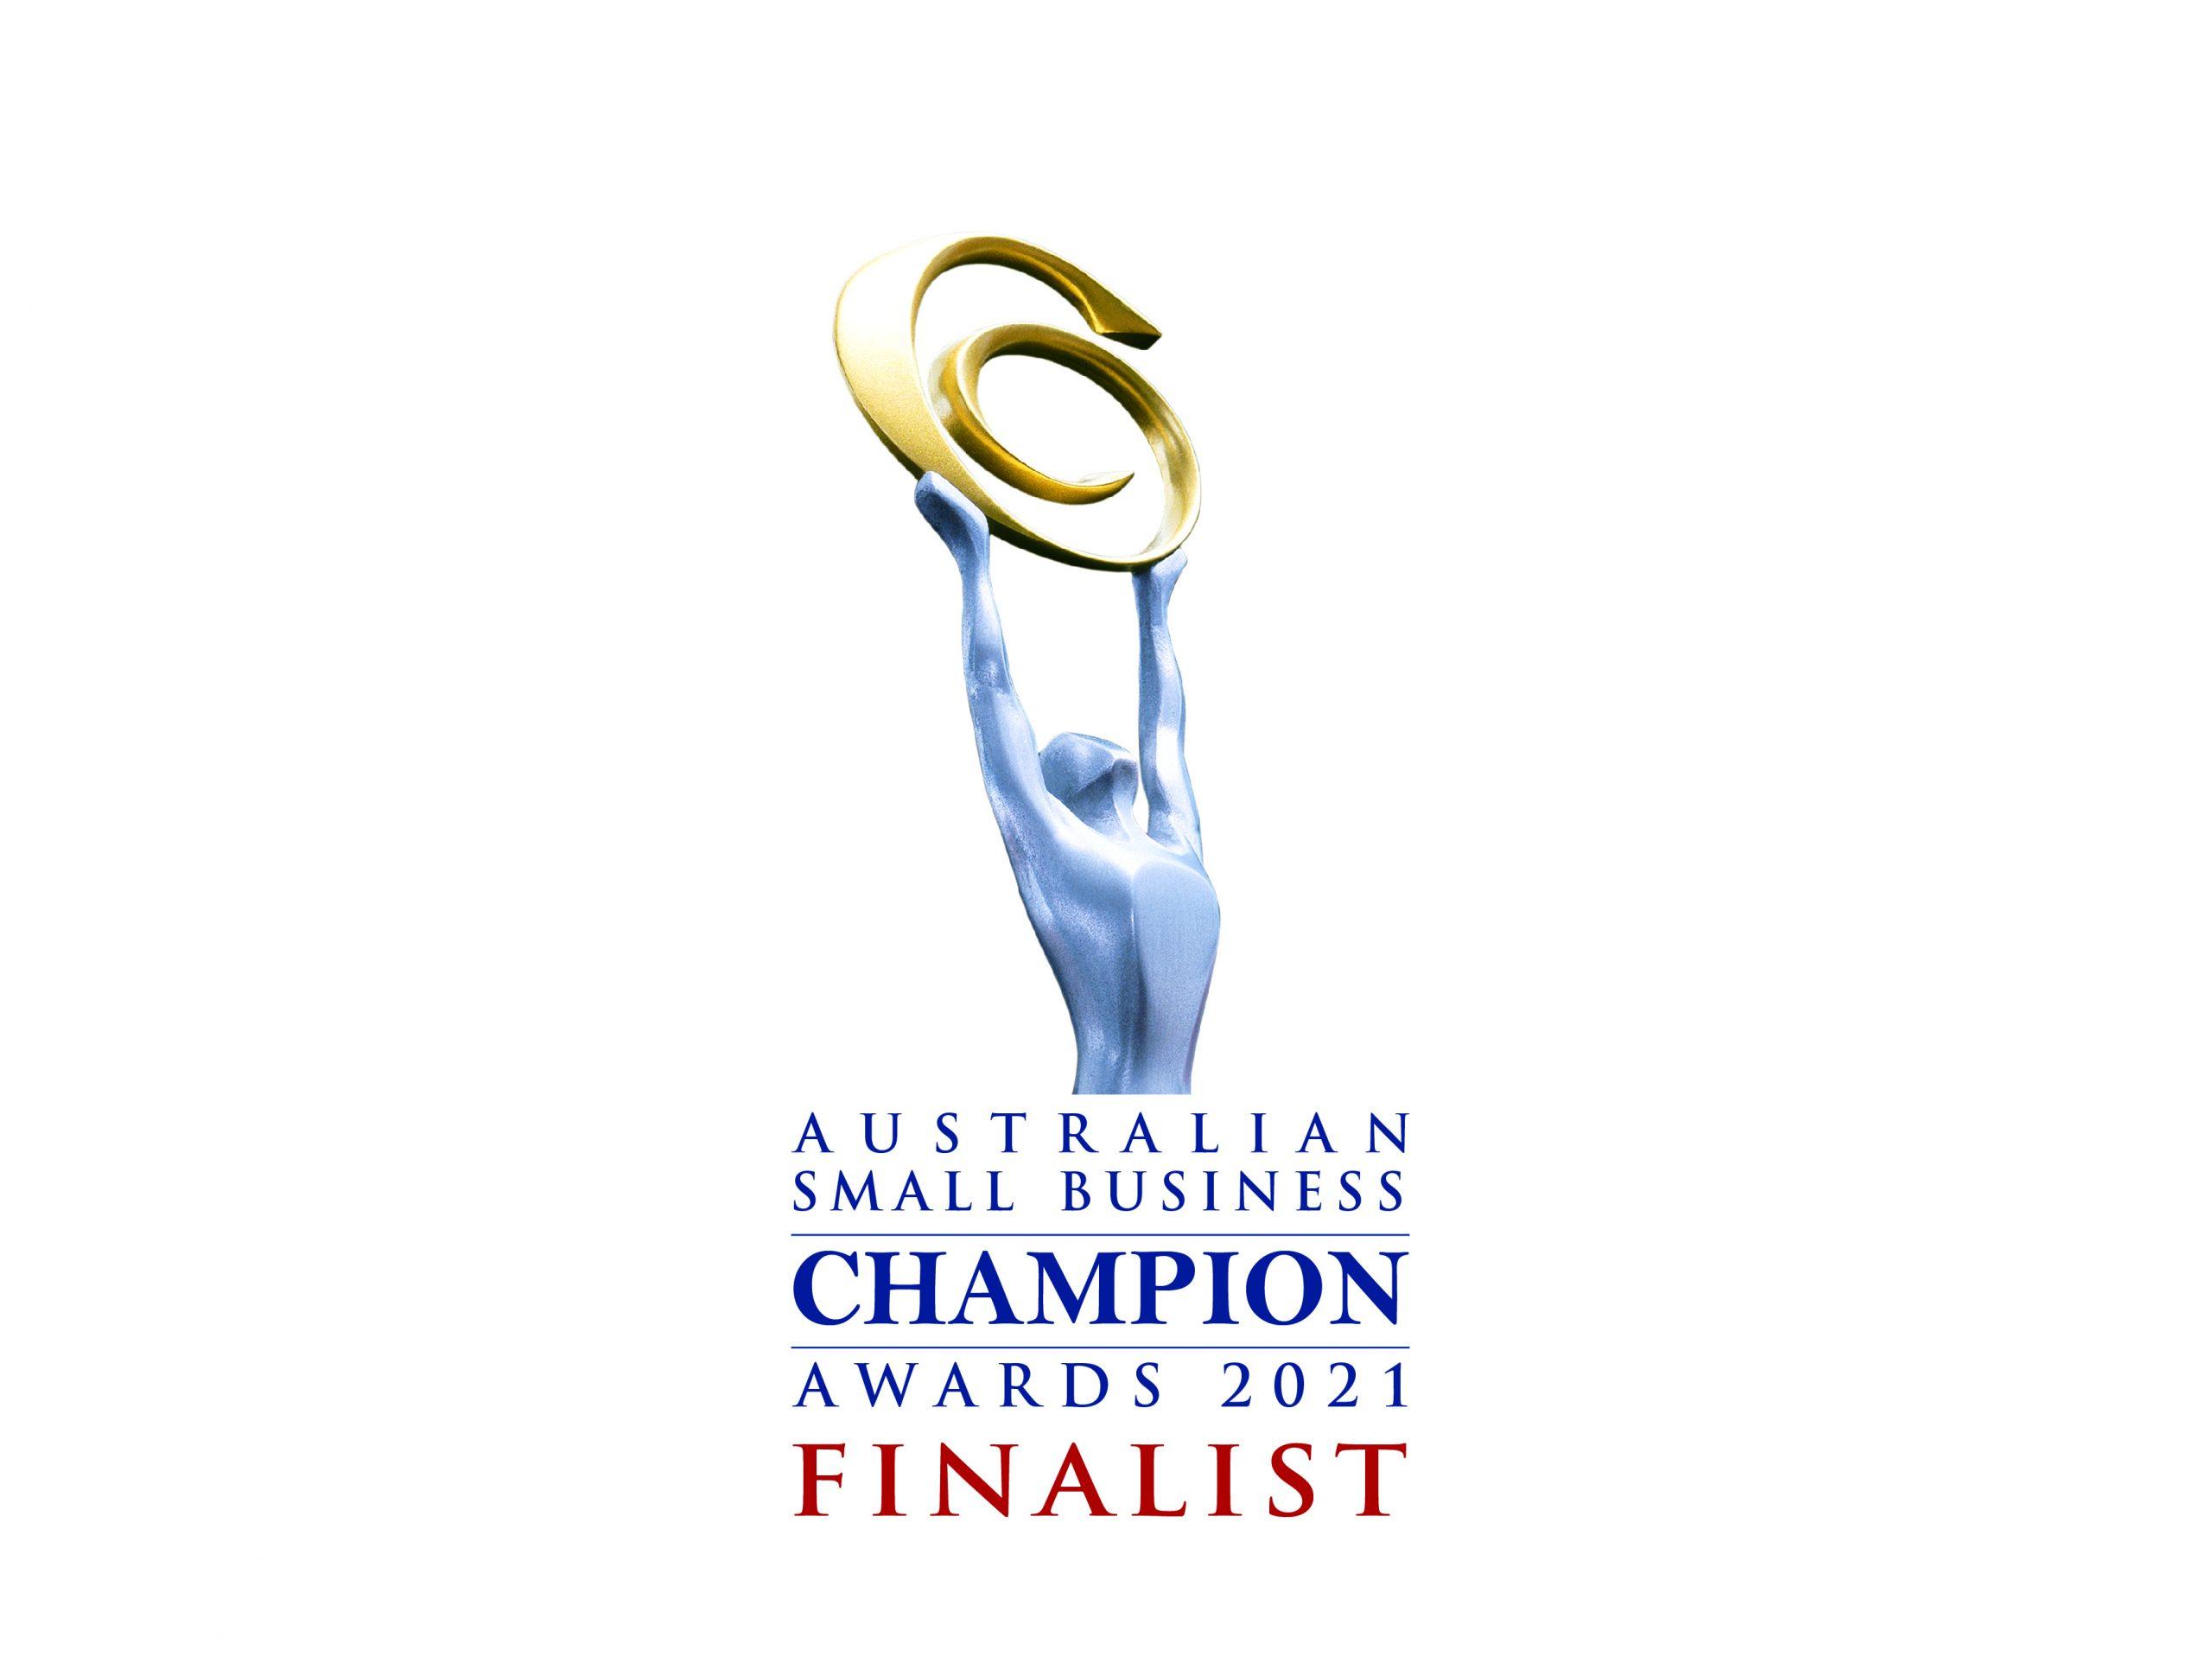 Small Business Champion Award 2021